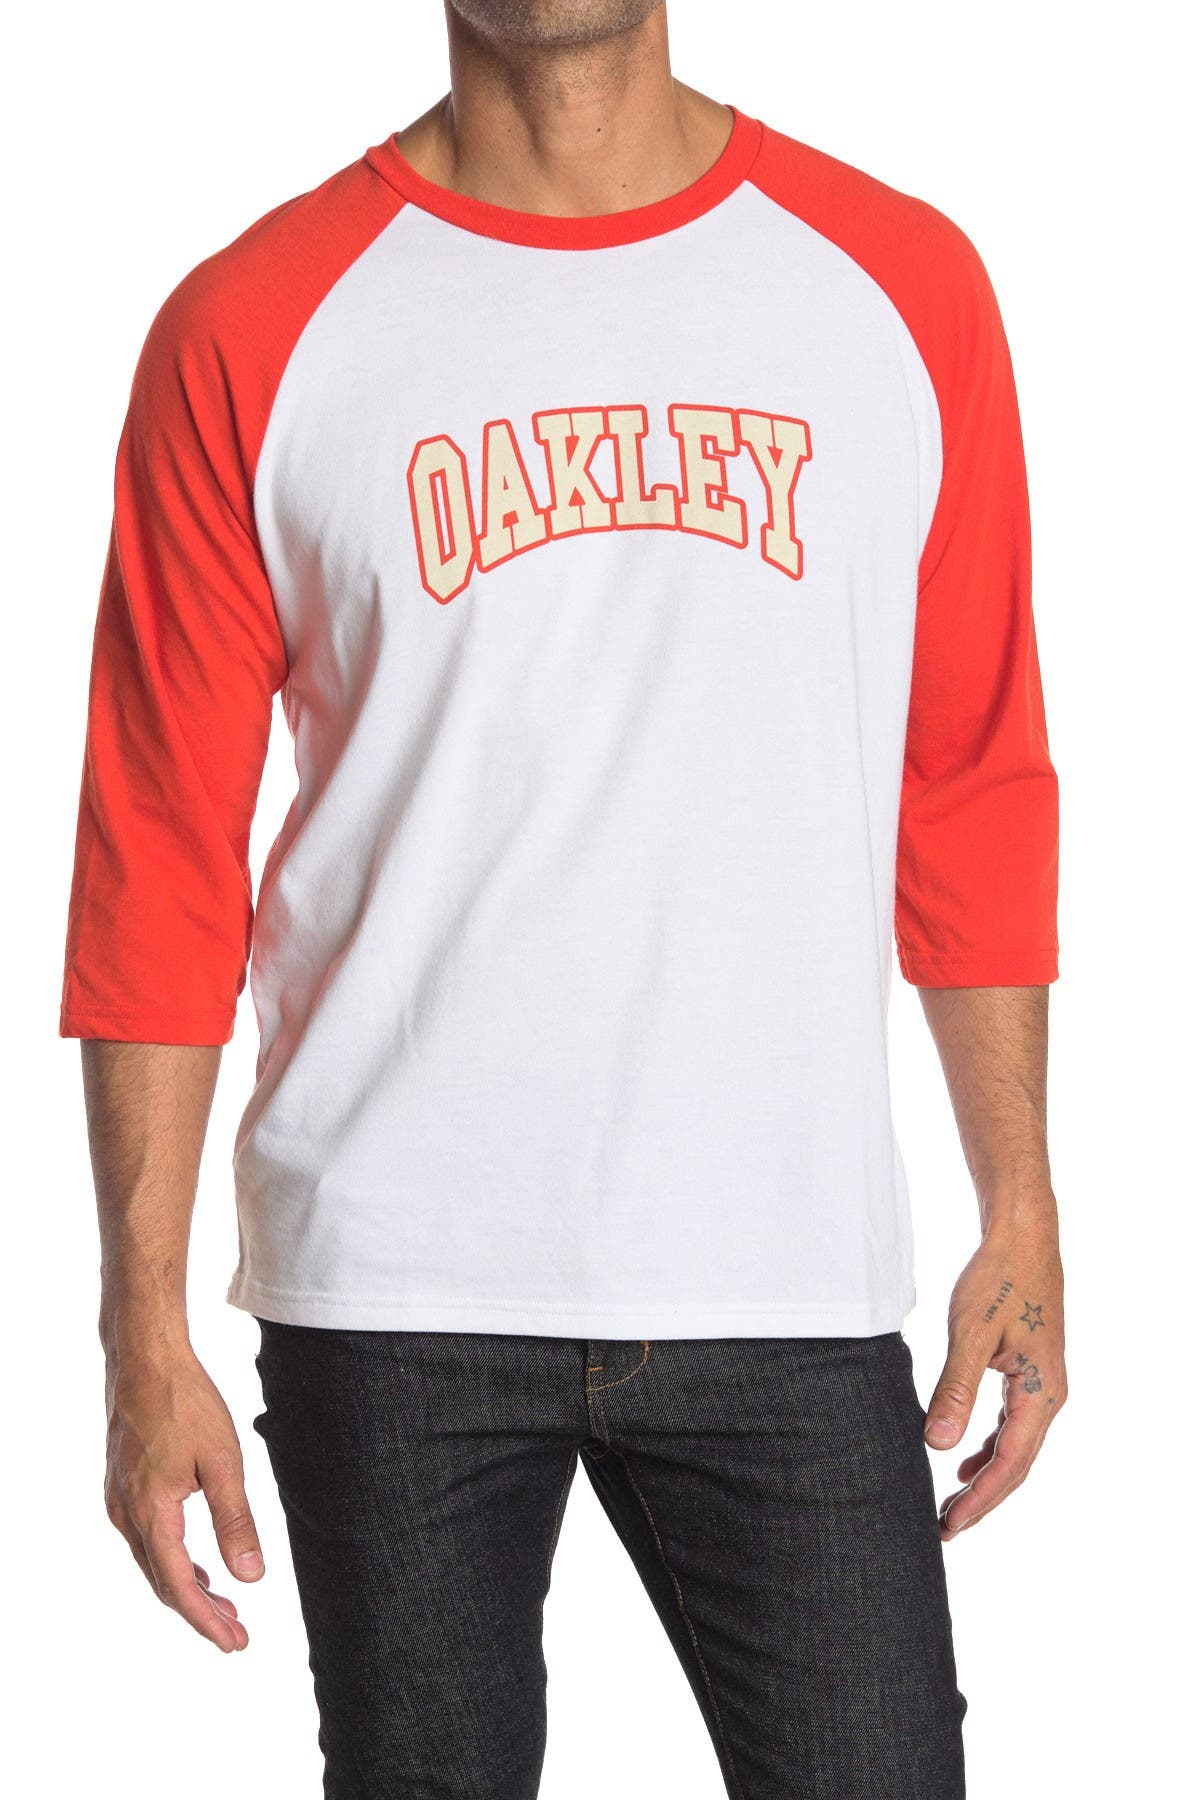 Image of Oakley Sport Logo Print 3/4 Raglan Sleeve T-Shirt